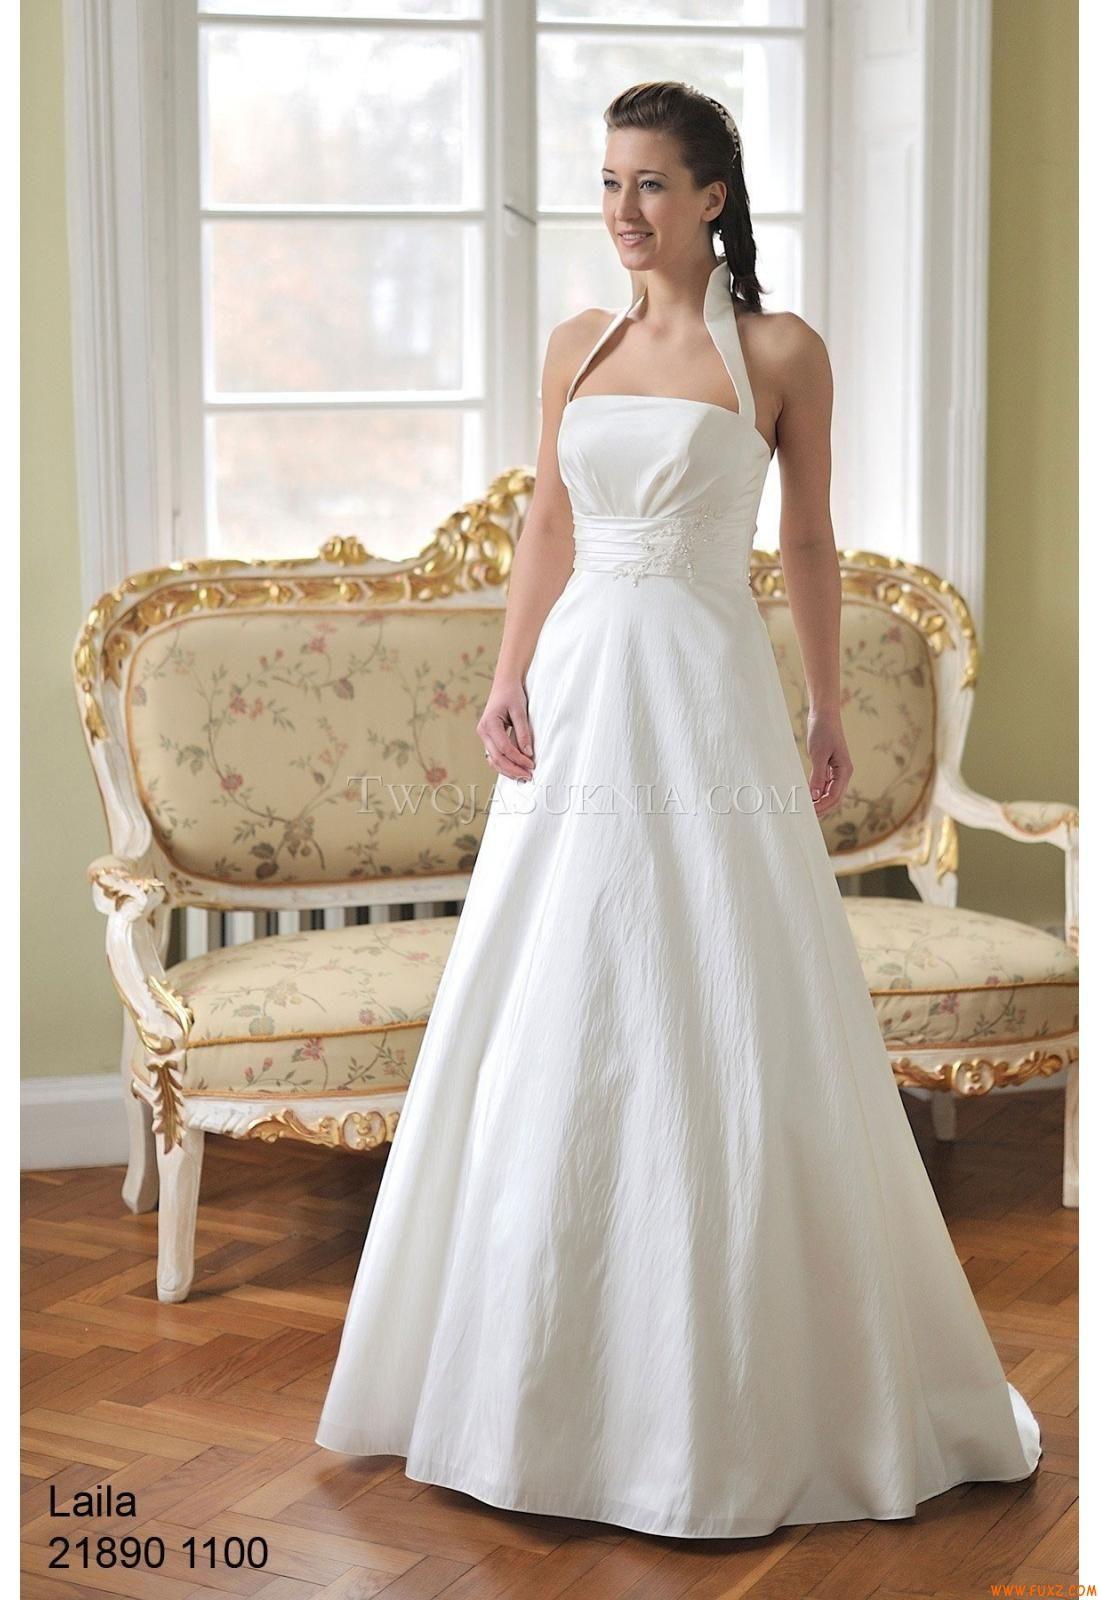 Country dresses for weddings  Wedding Dresses Lohrengel Laila Lignesse   cheap plus size